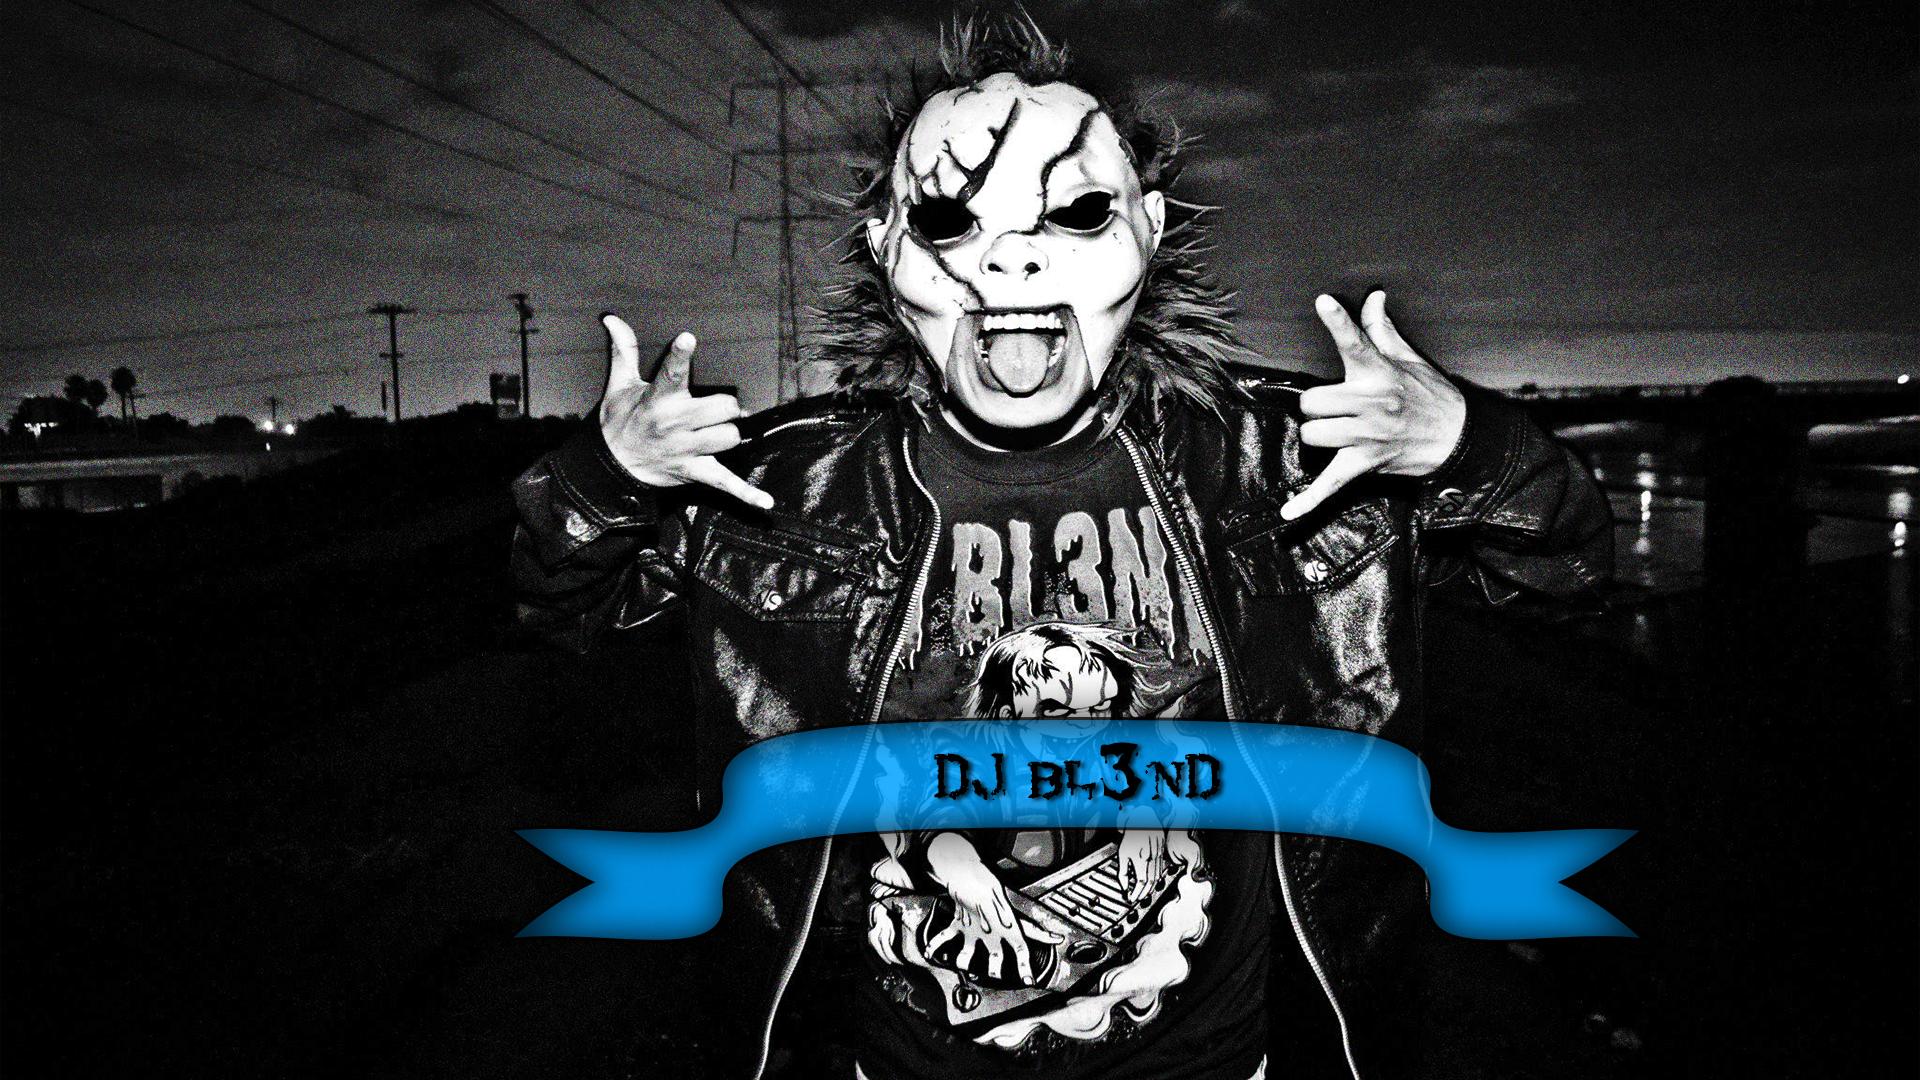 4 DJ BL3ND Fonds d'écran HD | Arrière-plans - Wallpaper Abyss